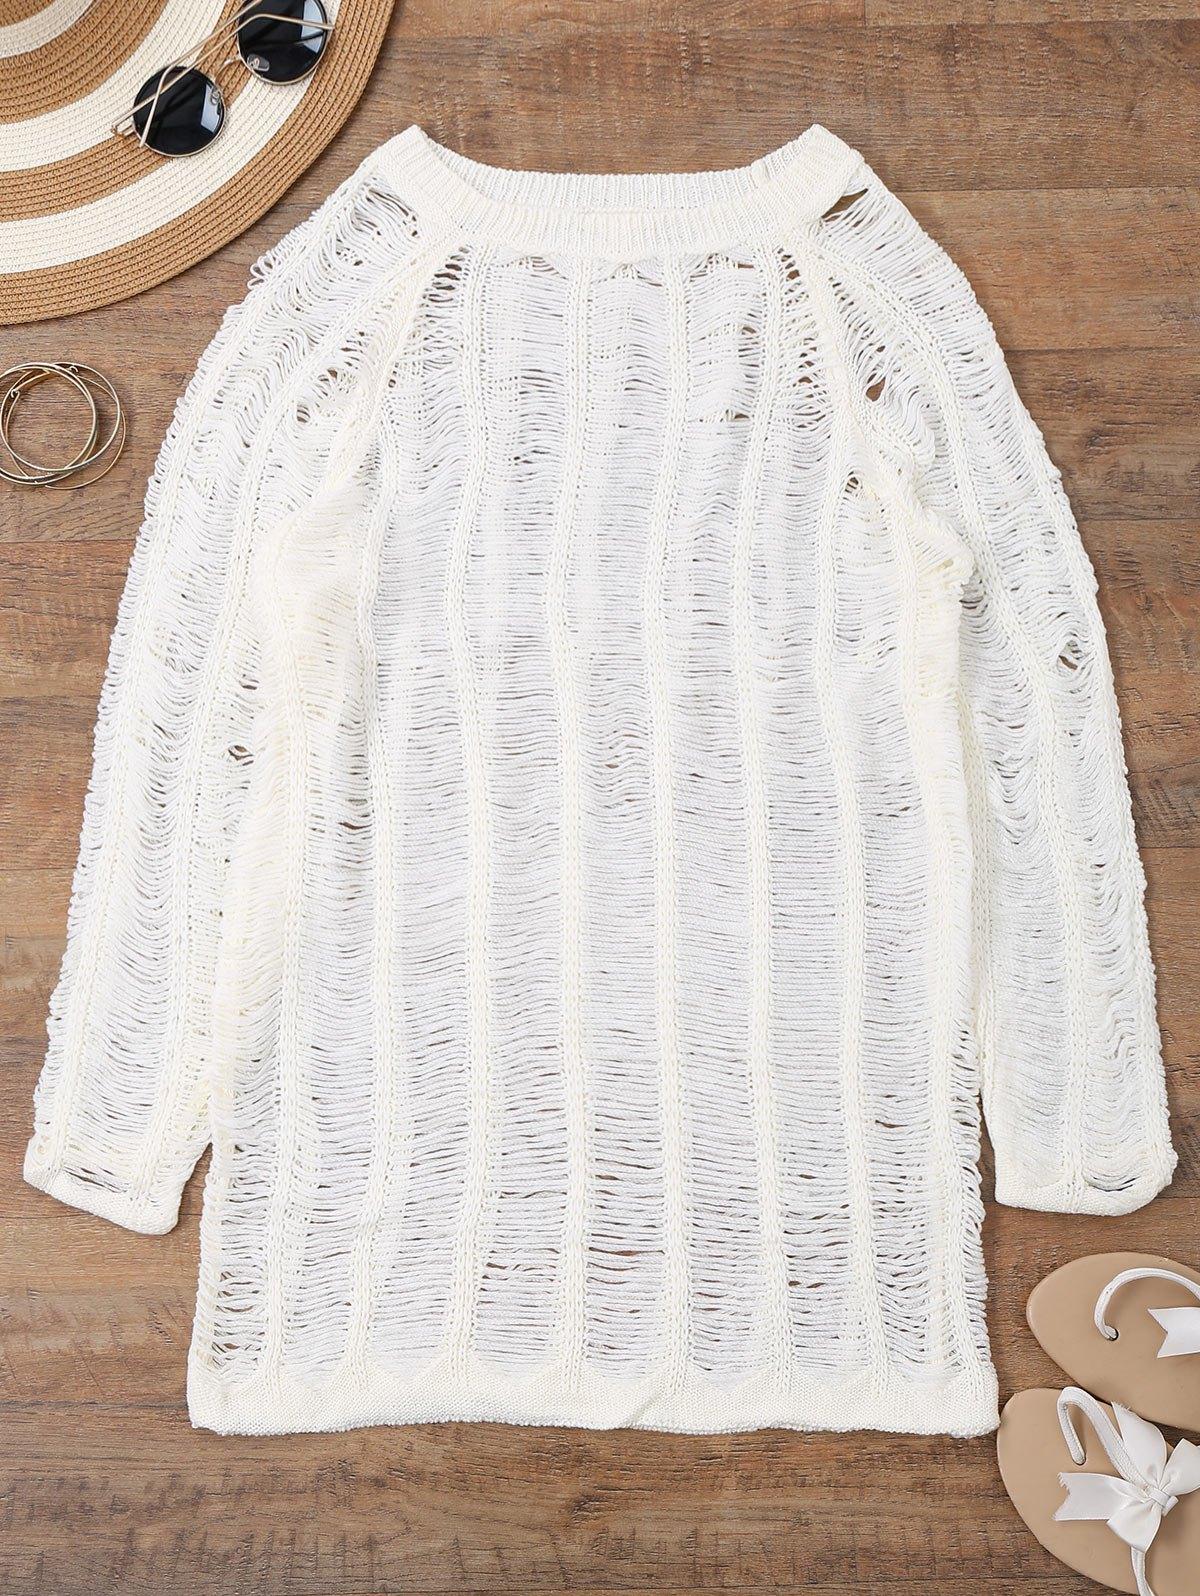 Long Sleeves Sheer Beach Cover Up Dress, White